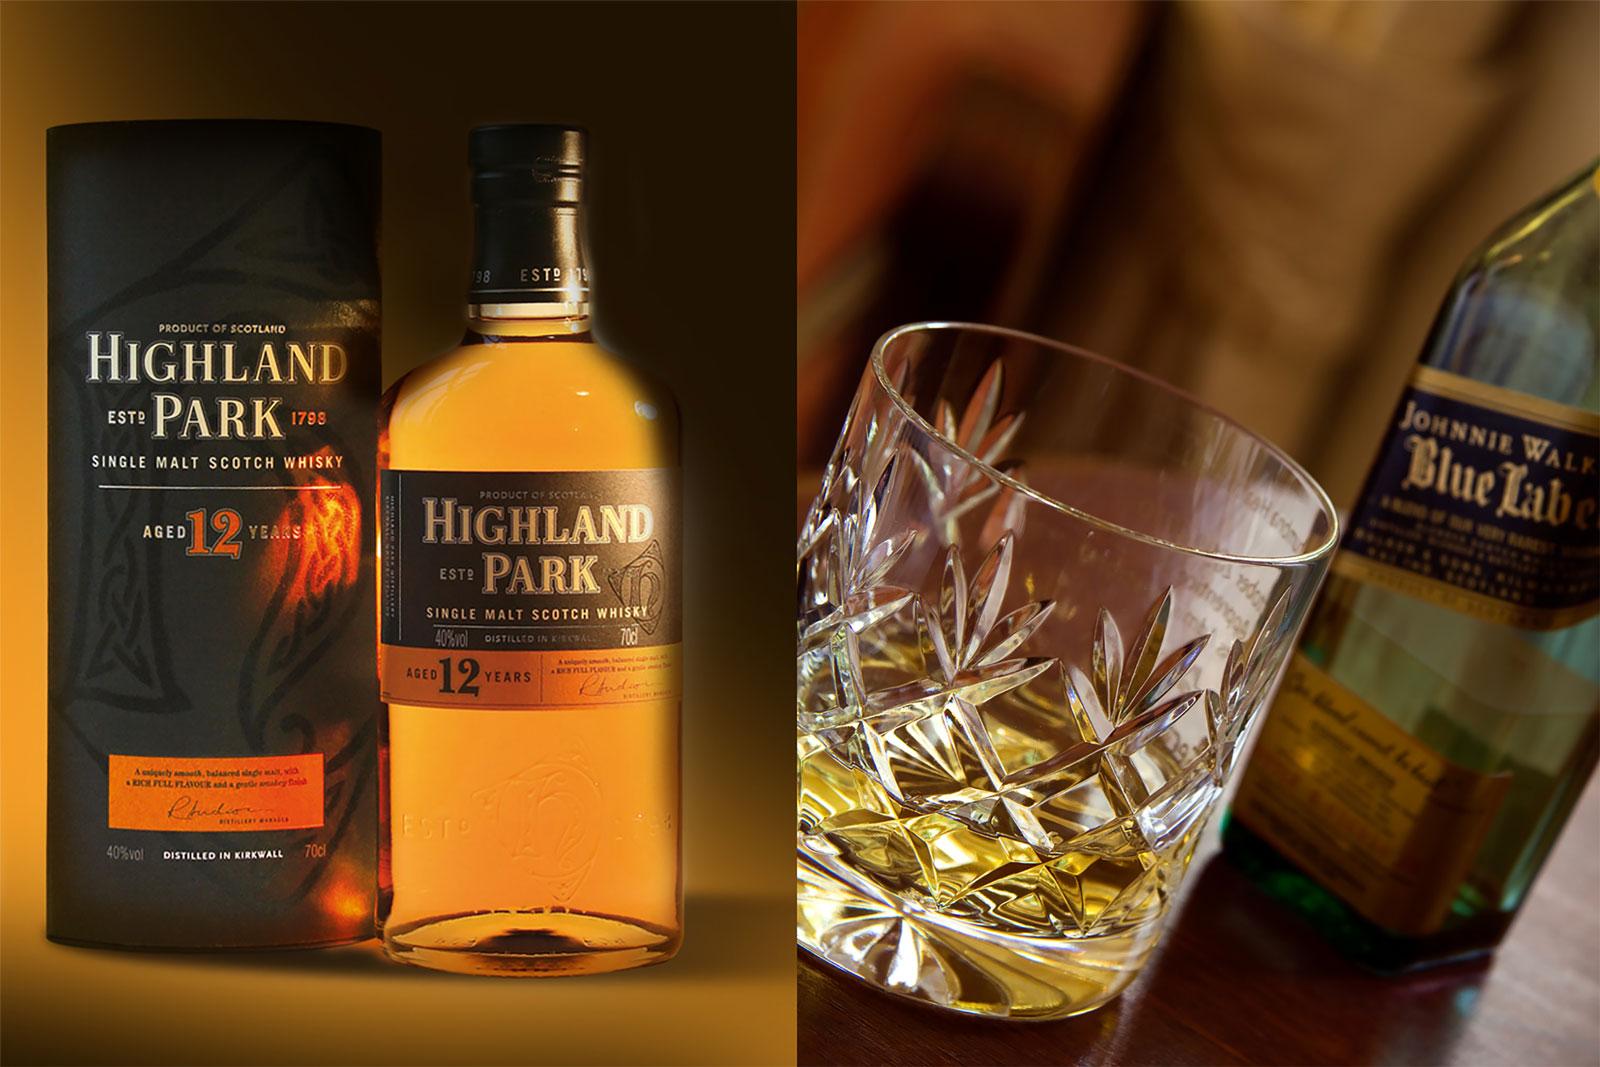 Highland Park Whiskey & Johnnie Walker Blue Label